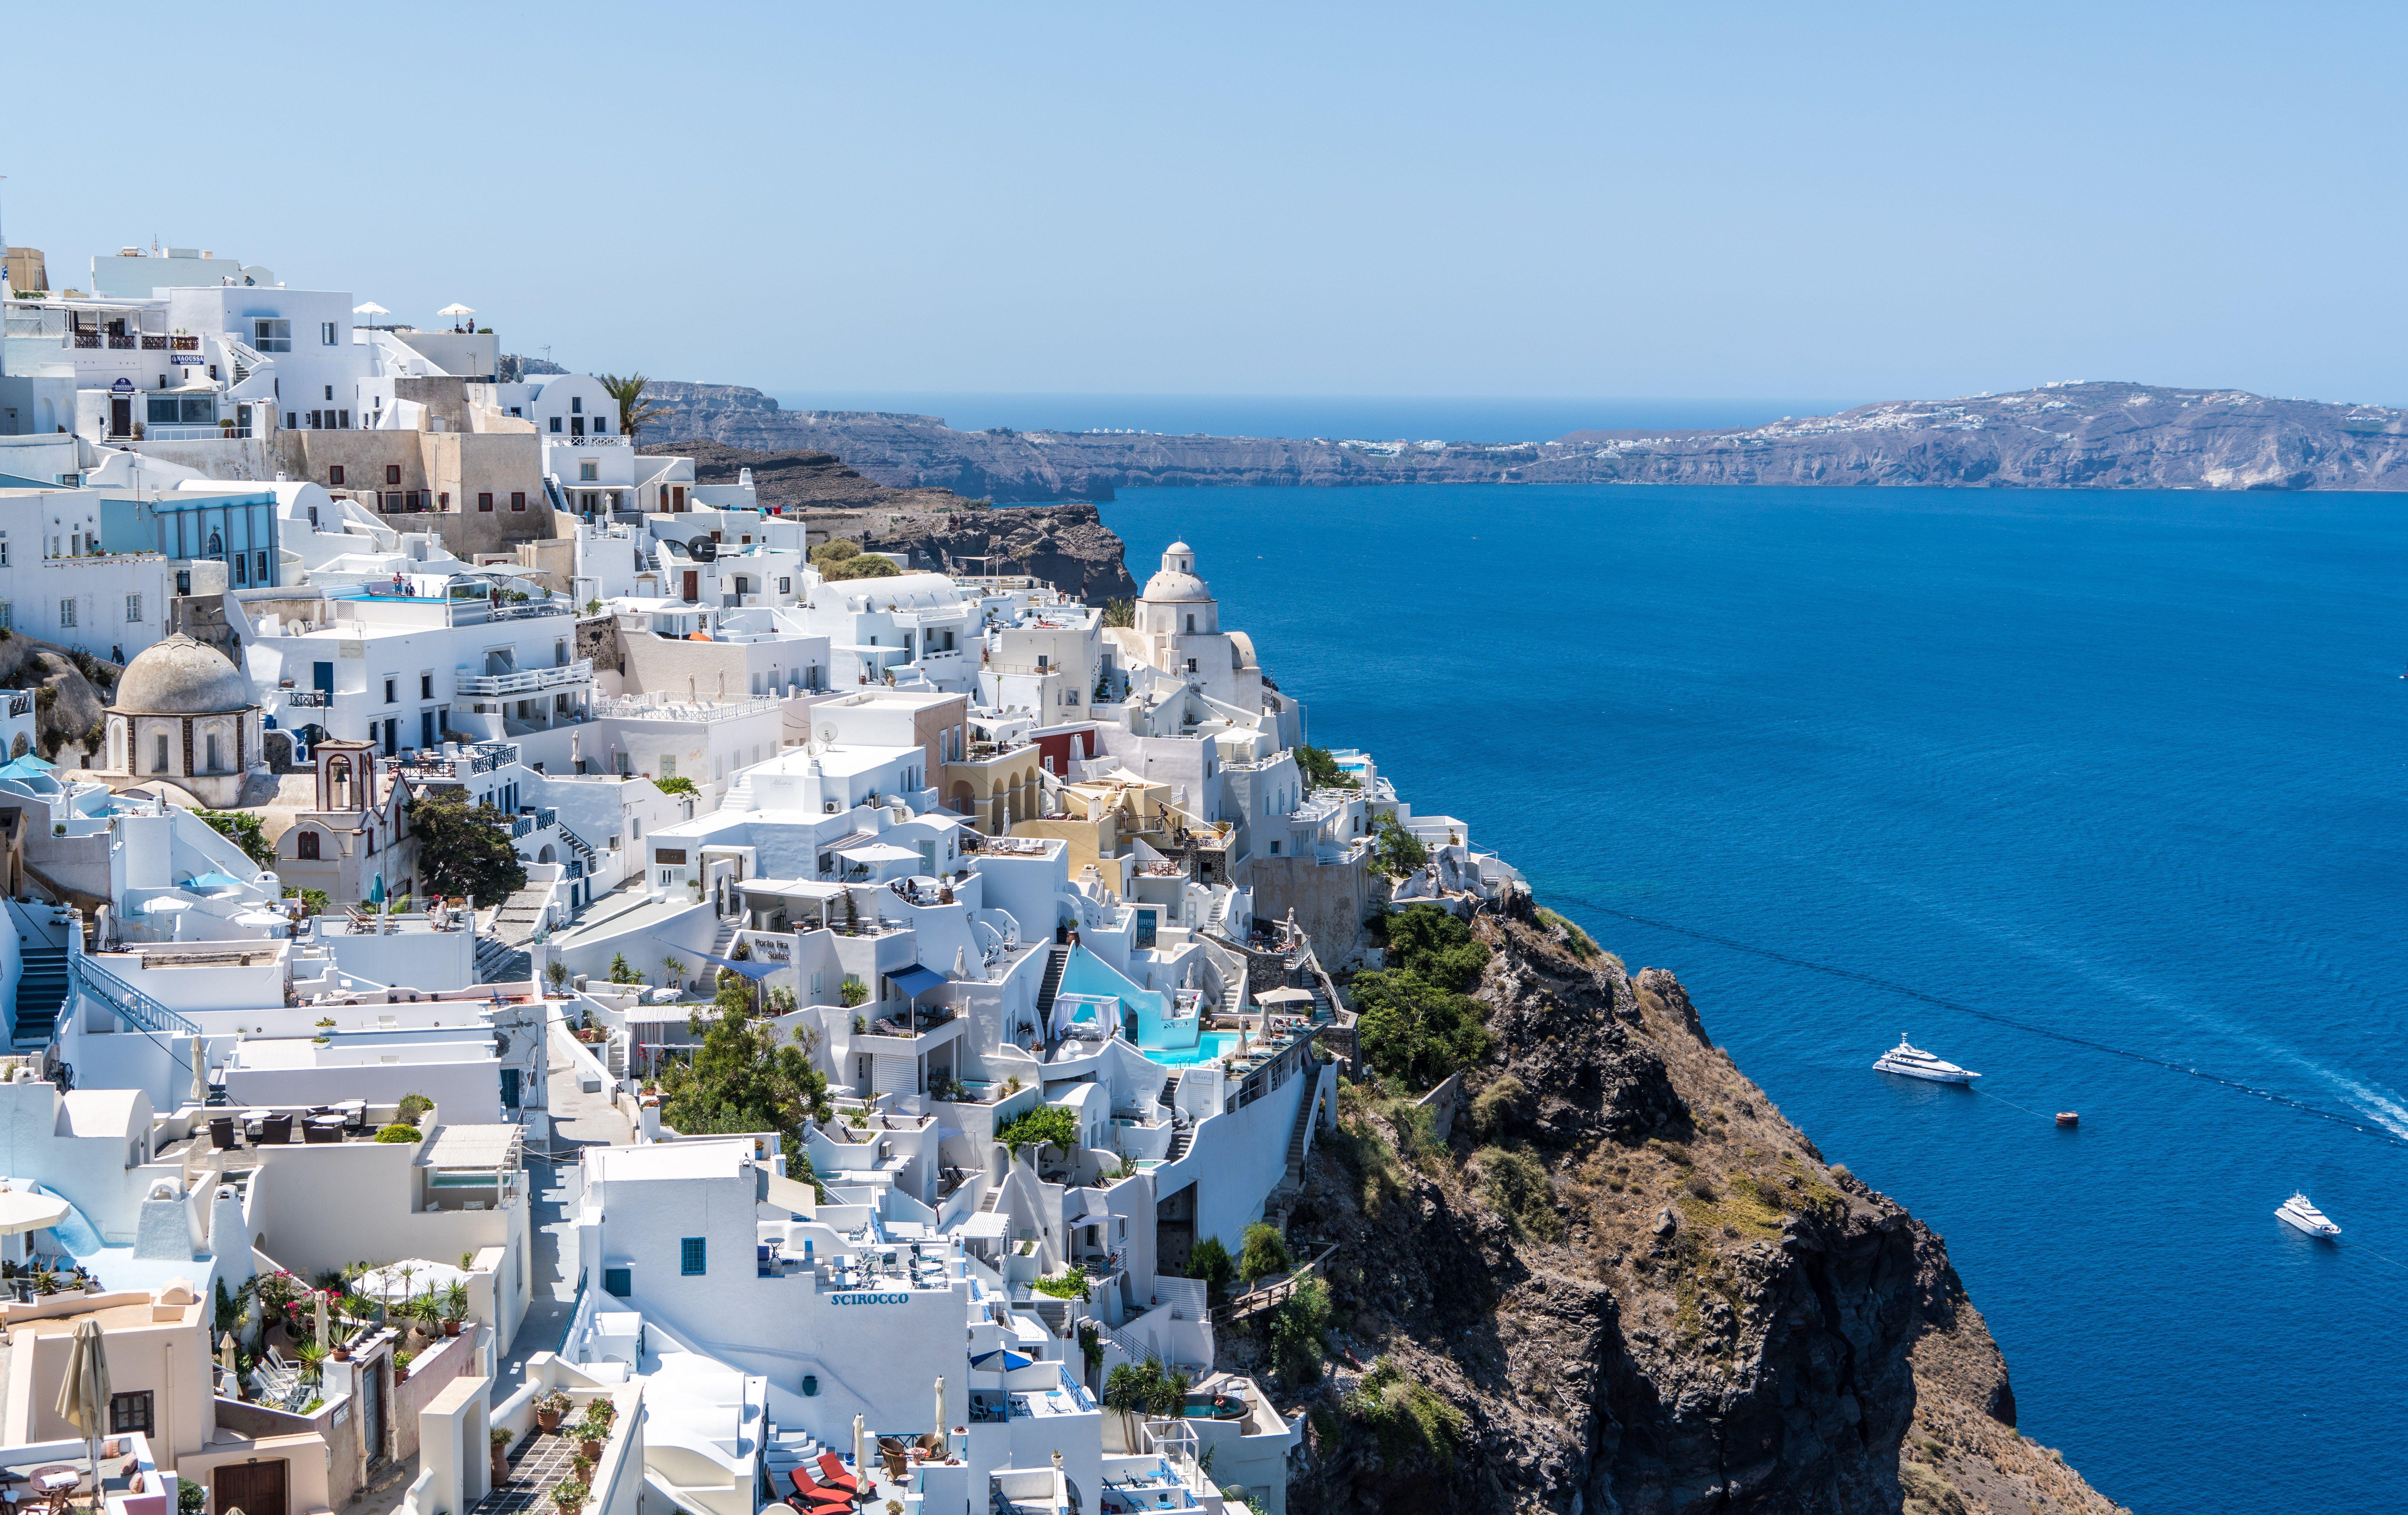 Greek coastline with buildings and water.